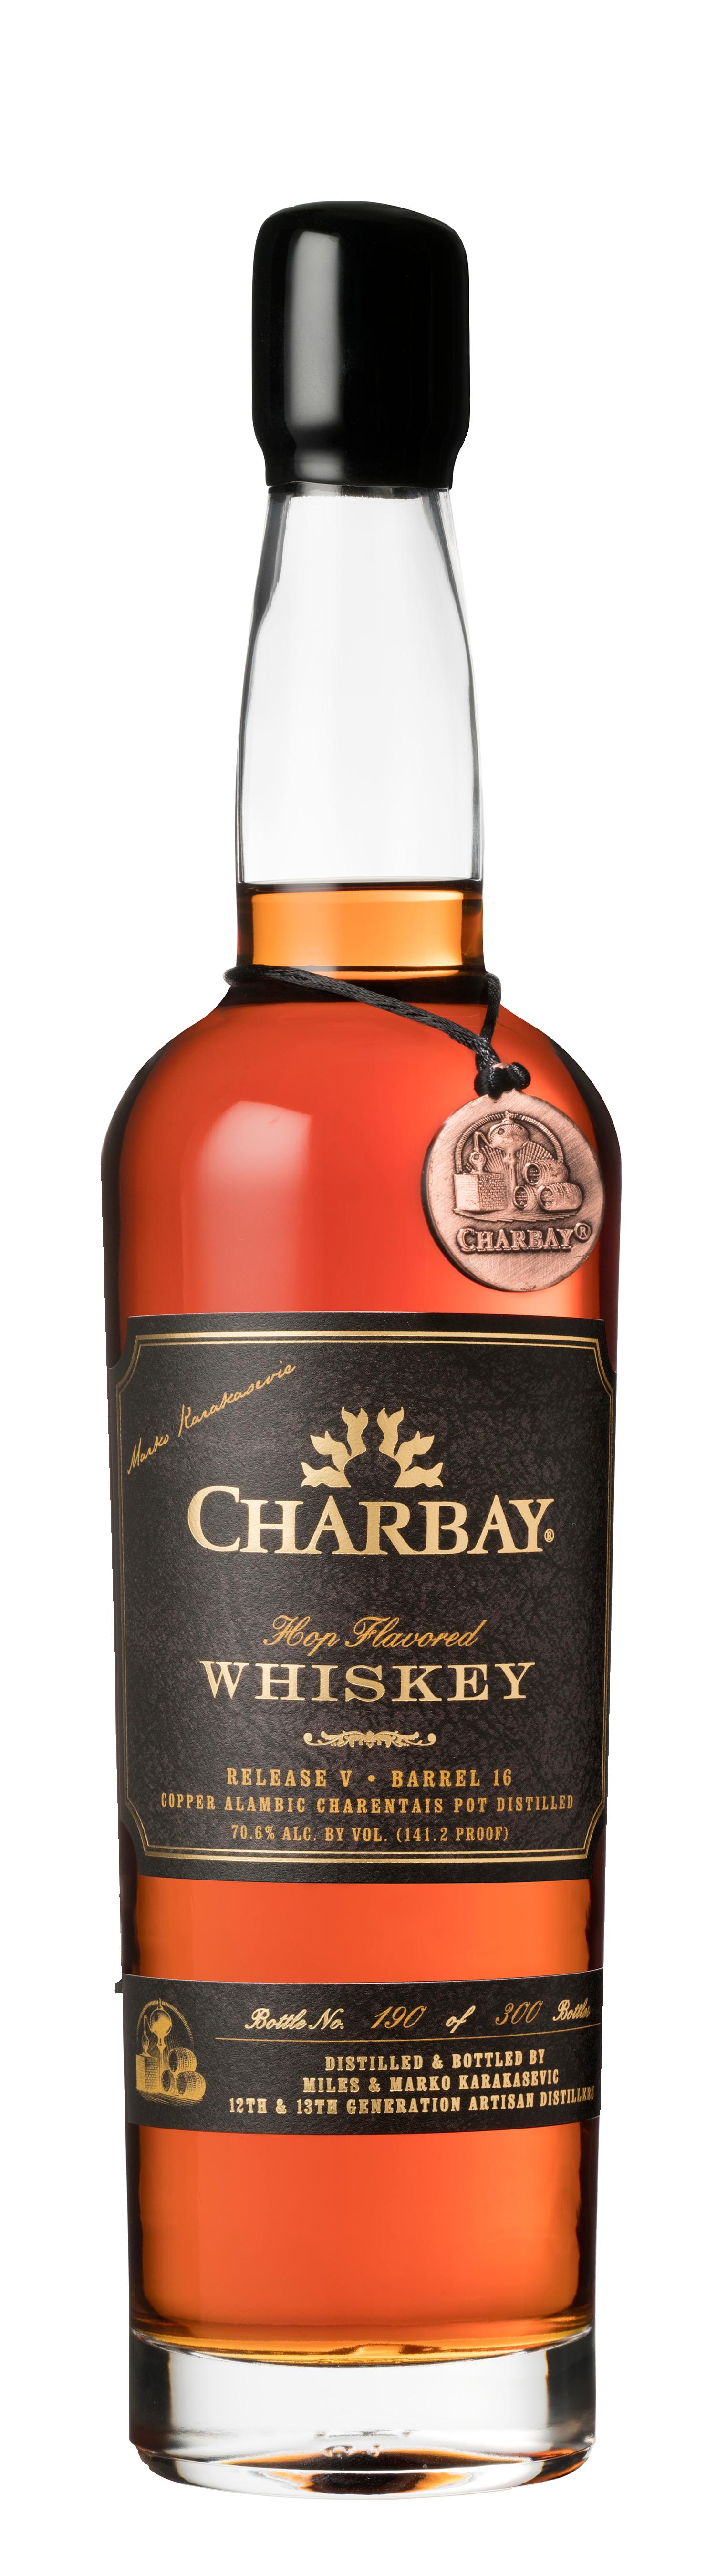 Whiskey Release V